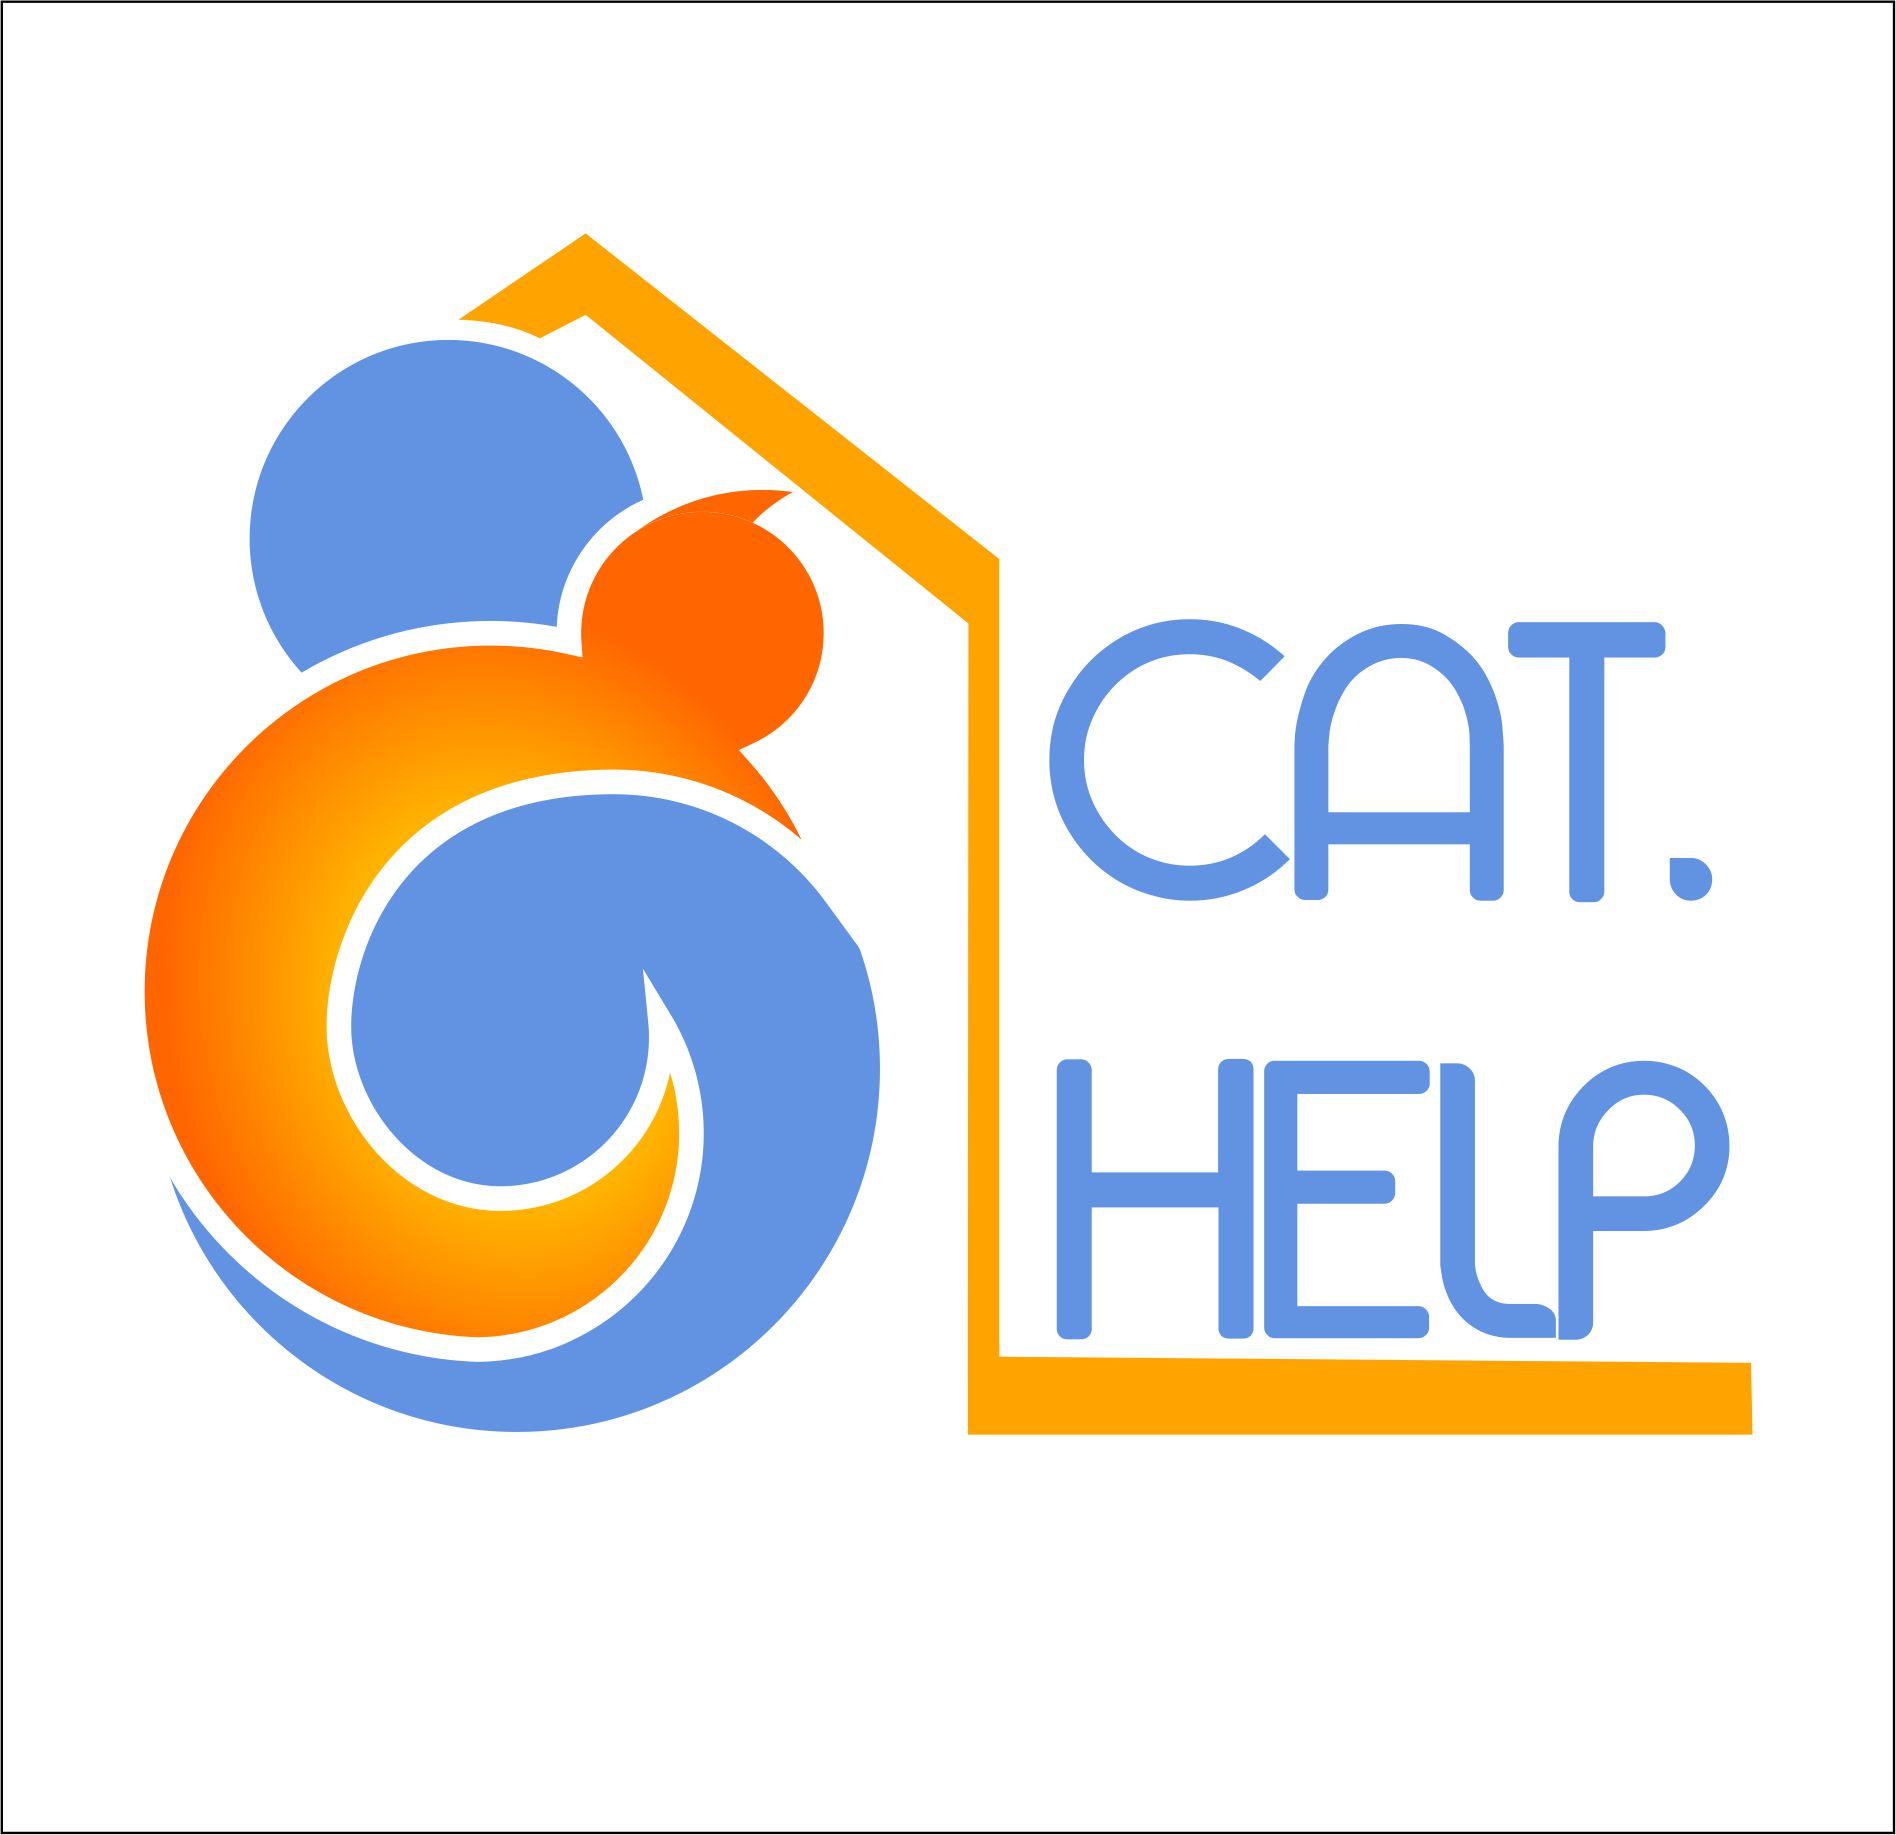 логотип для сайта и группы вк - cat.help фото f_98859dd01aea4859.jpg